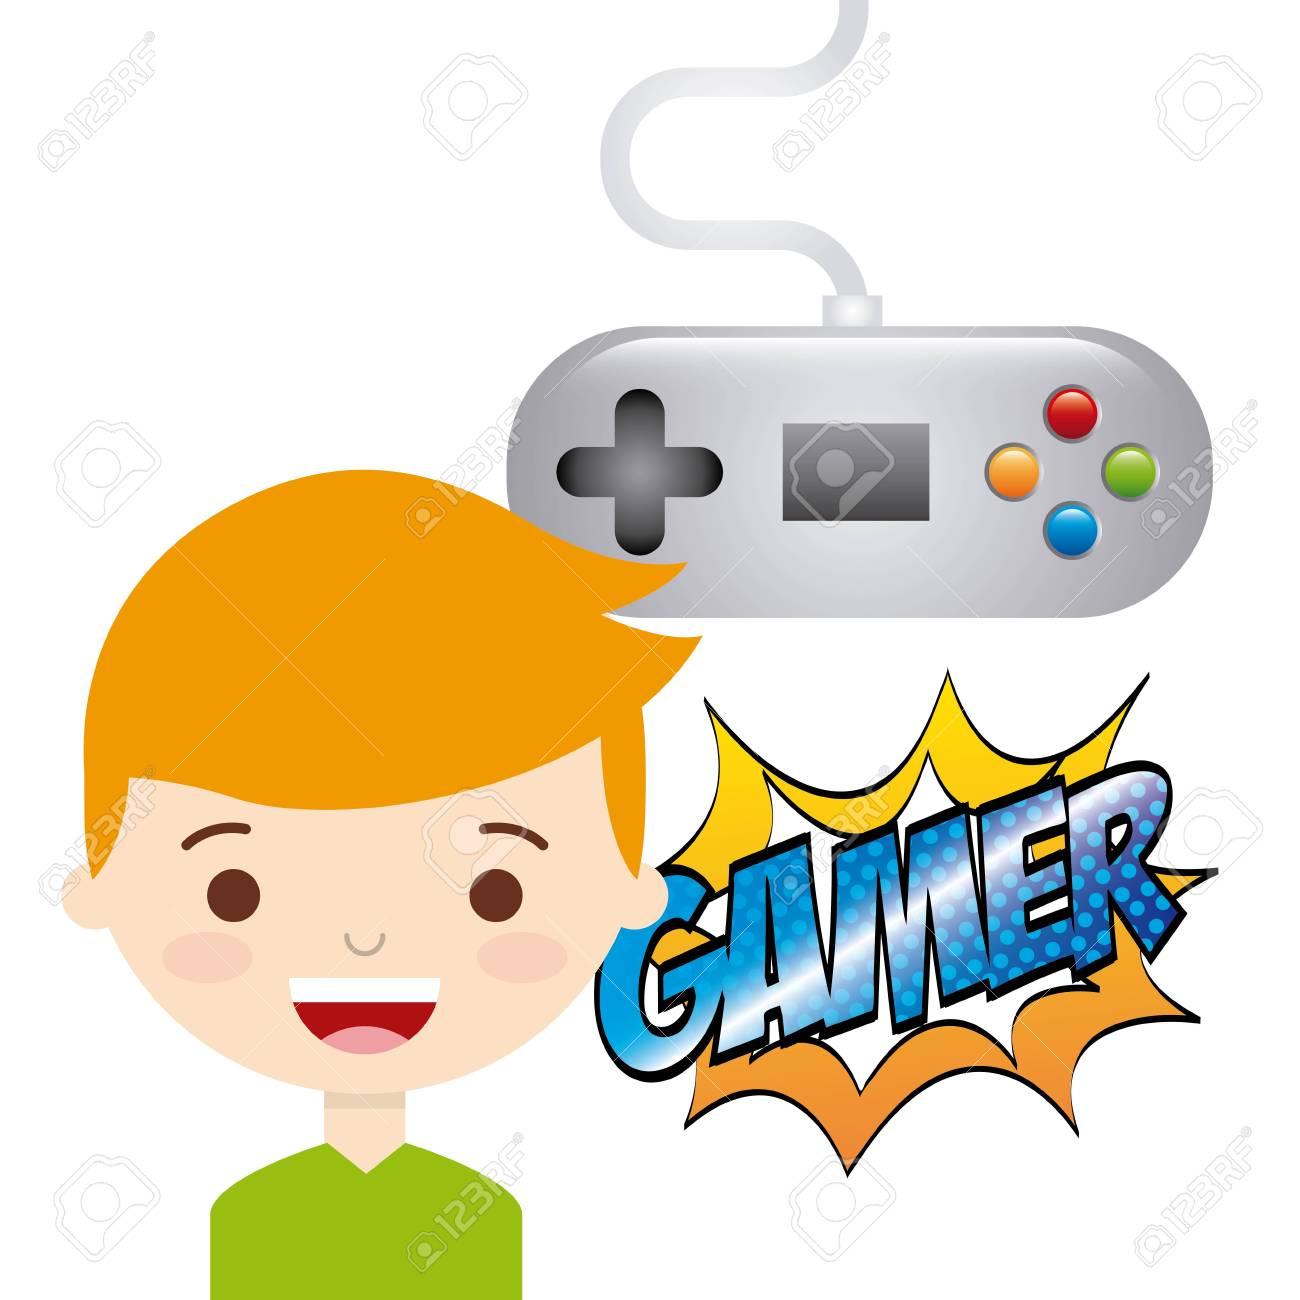 video game design, vector illustration eps10 graphic.